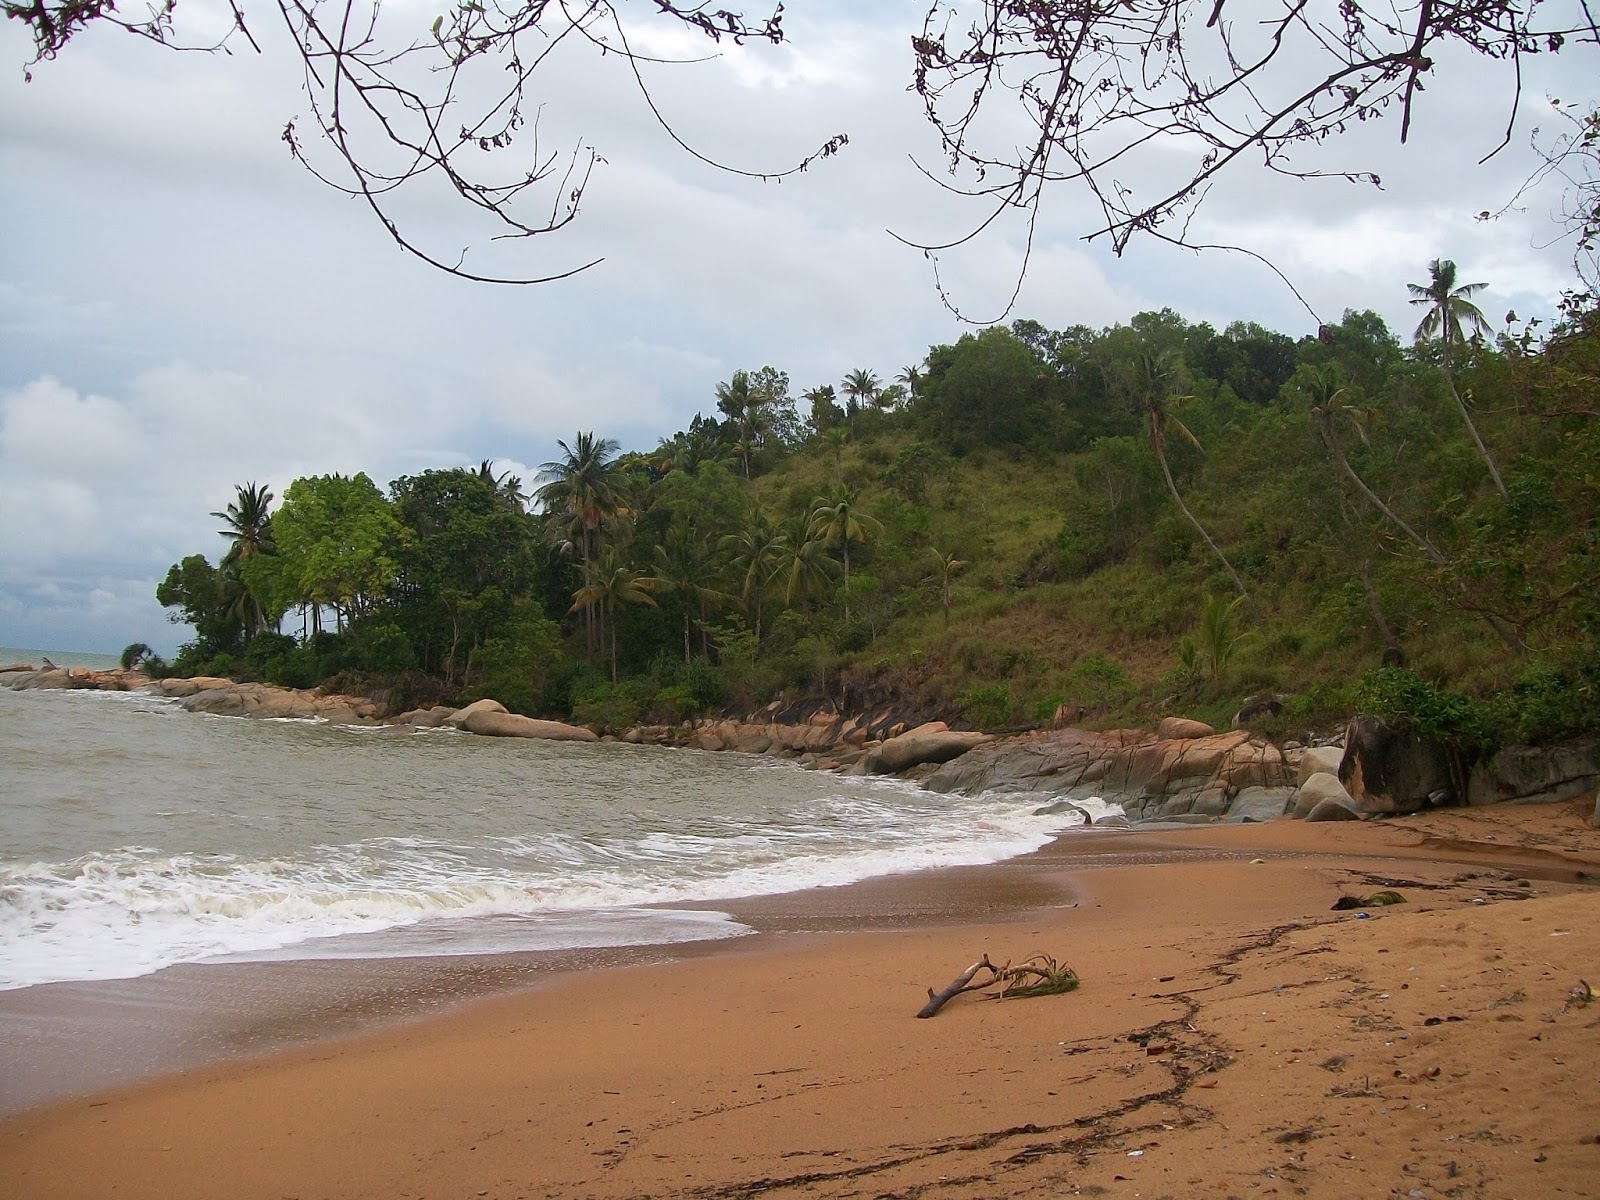 Pantai Kura Wisata Wajib Kunjungi Keindahan Kota Singkawang